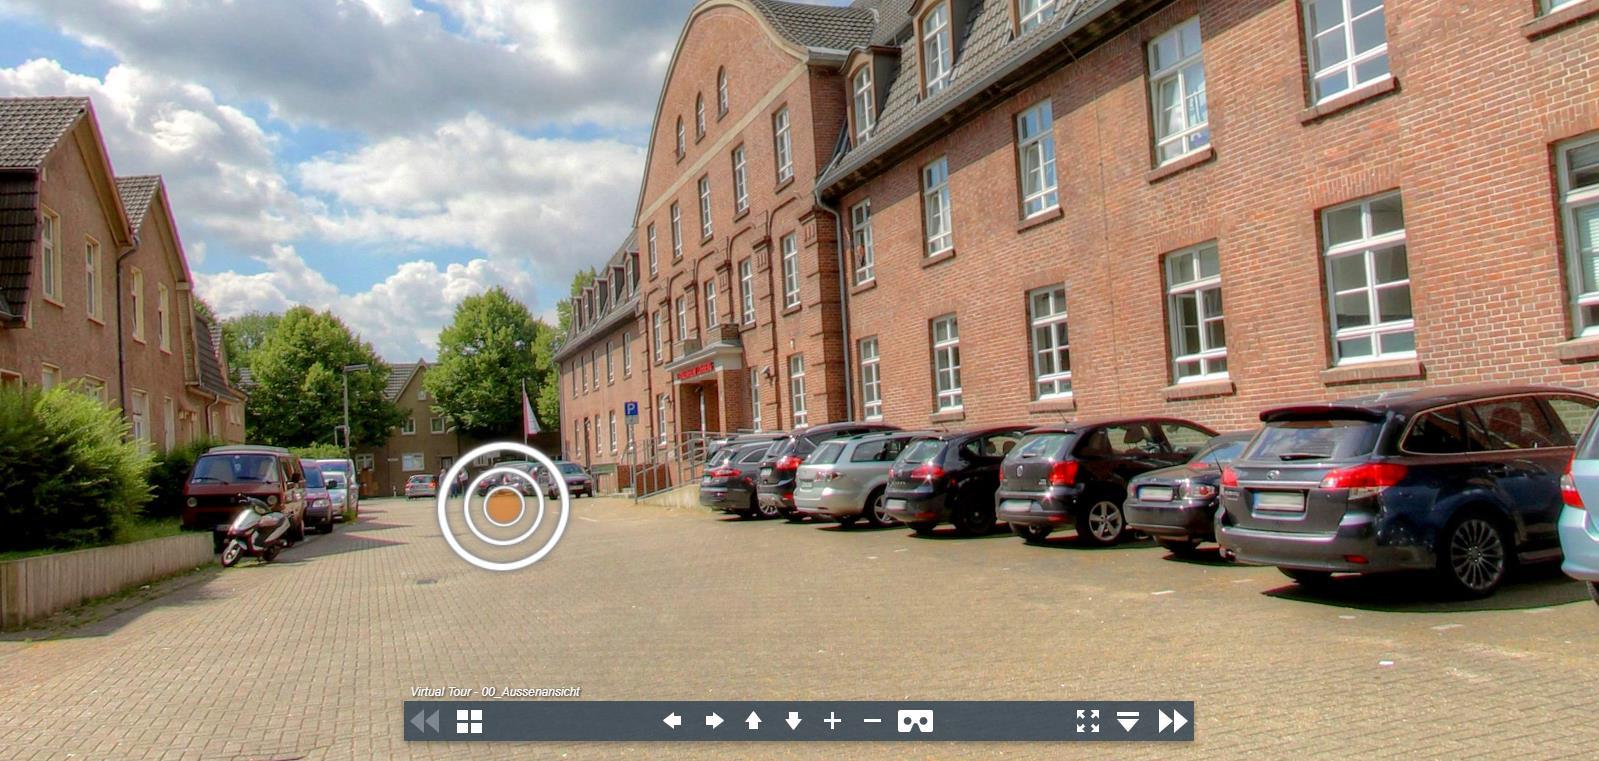 Virtueller Rundgang durchs Ledigenheim